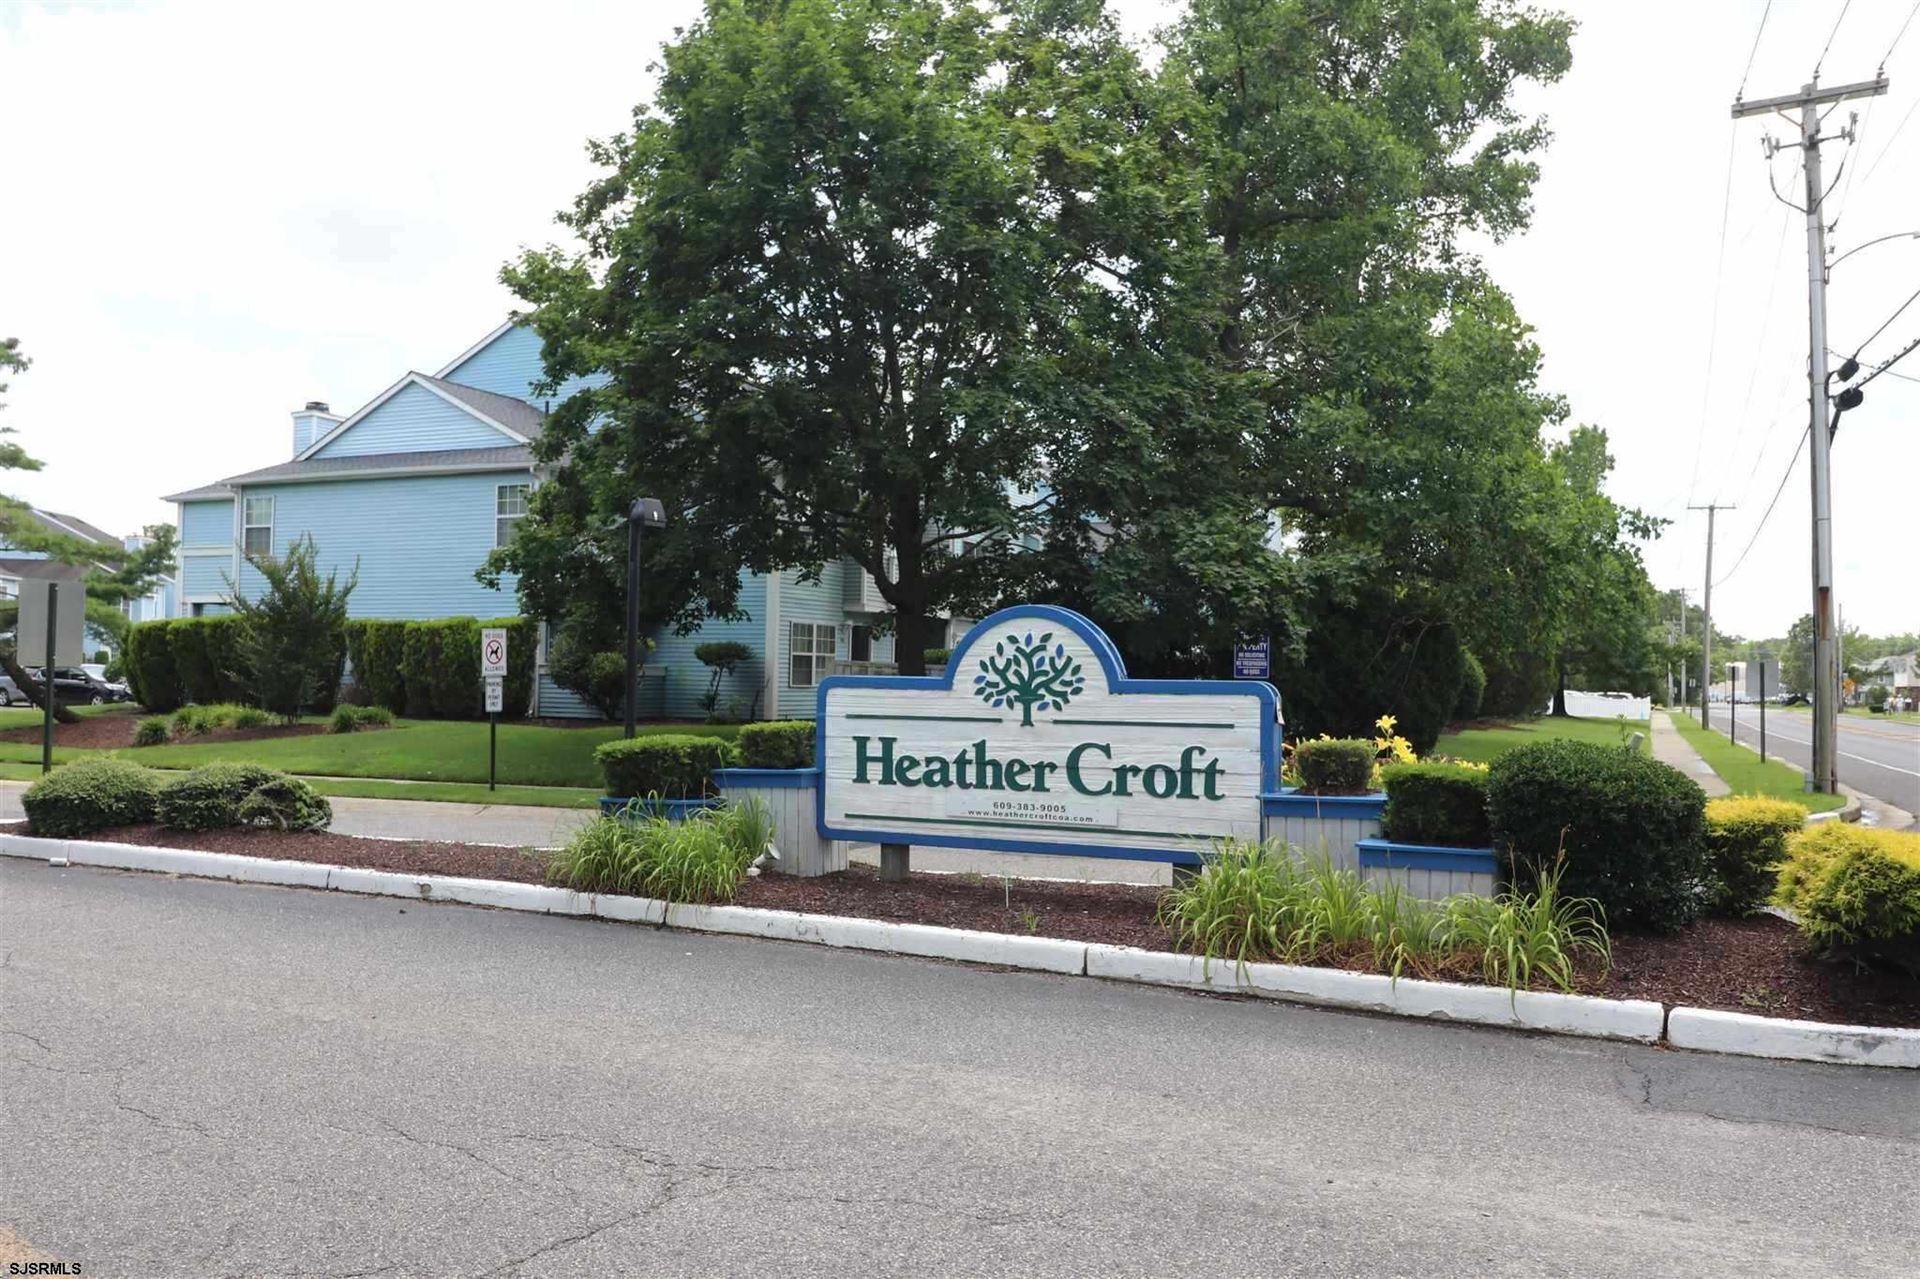 272 Heathercroft, Egg Harbor, NJ 08234 - #: 552995